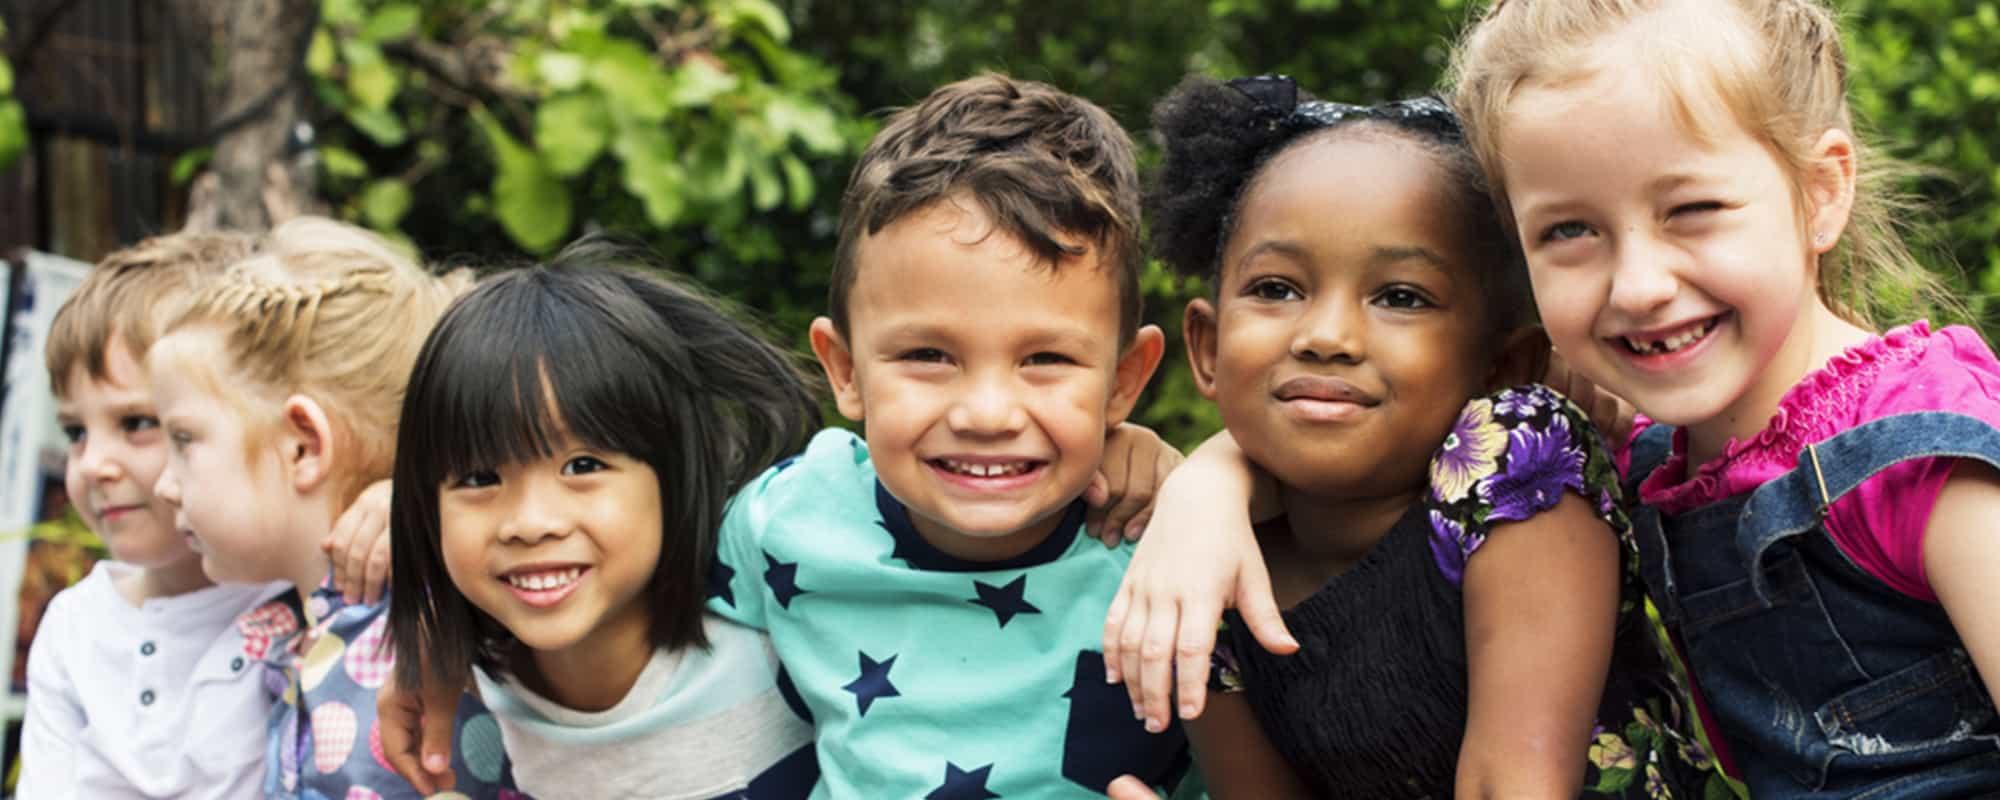 Raising An Inclusive Child